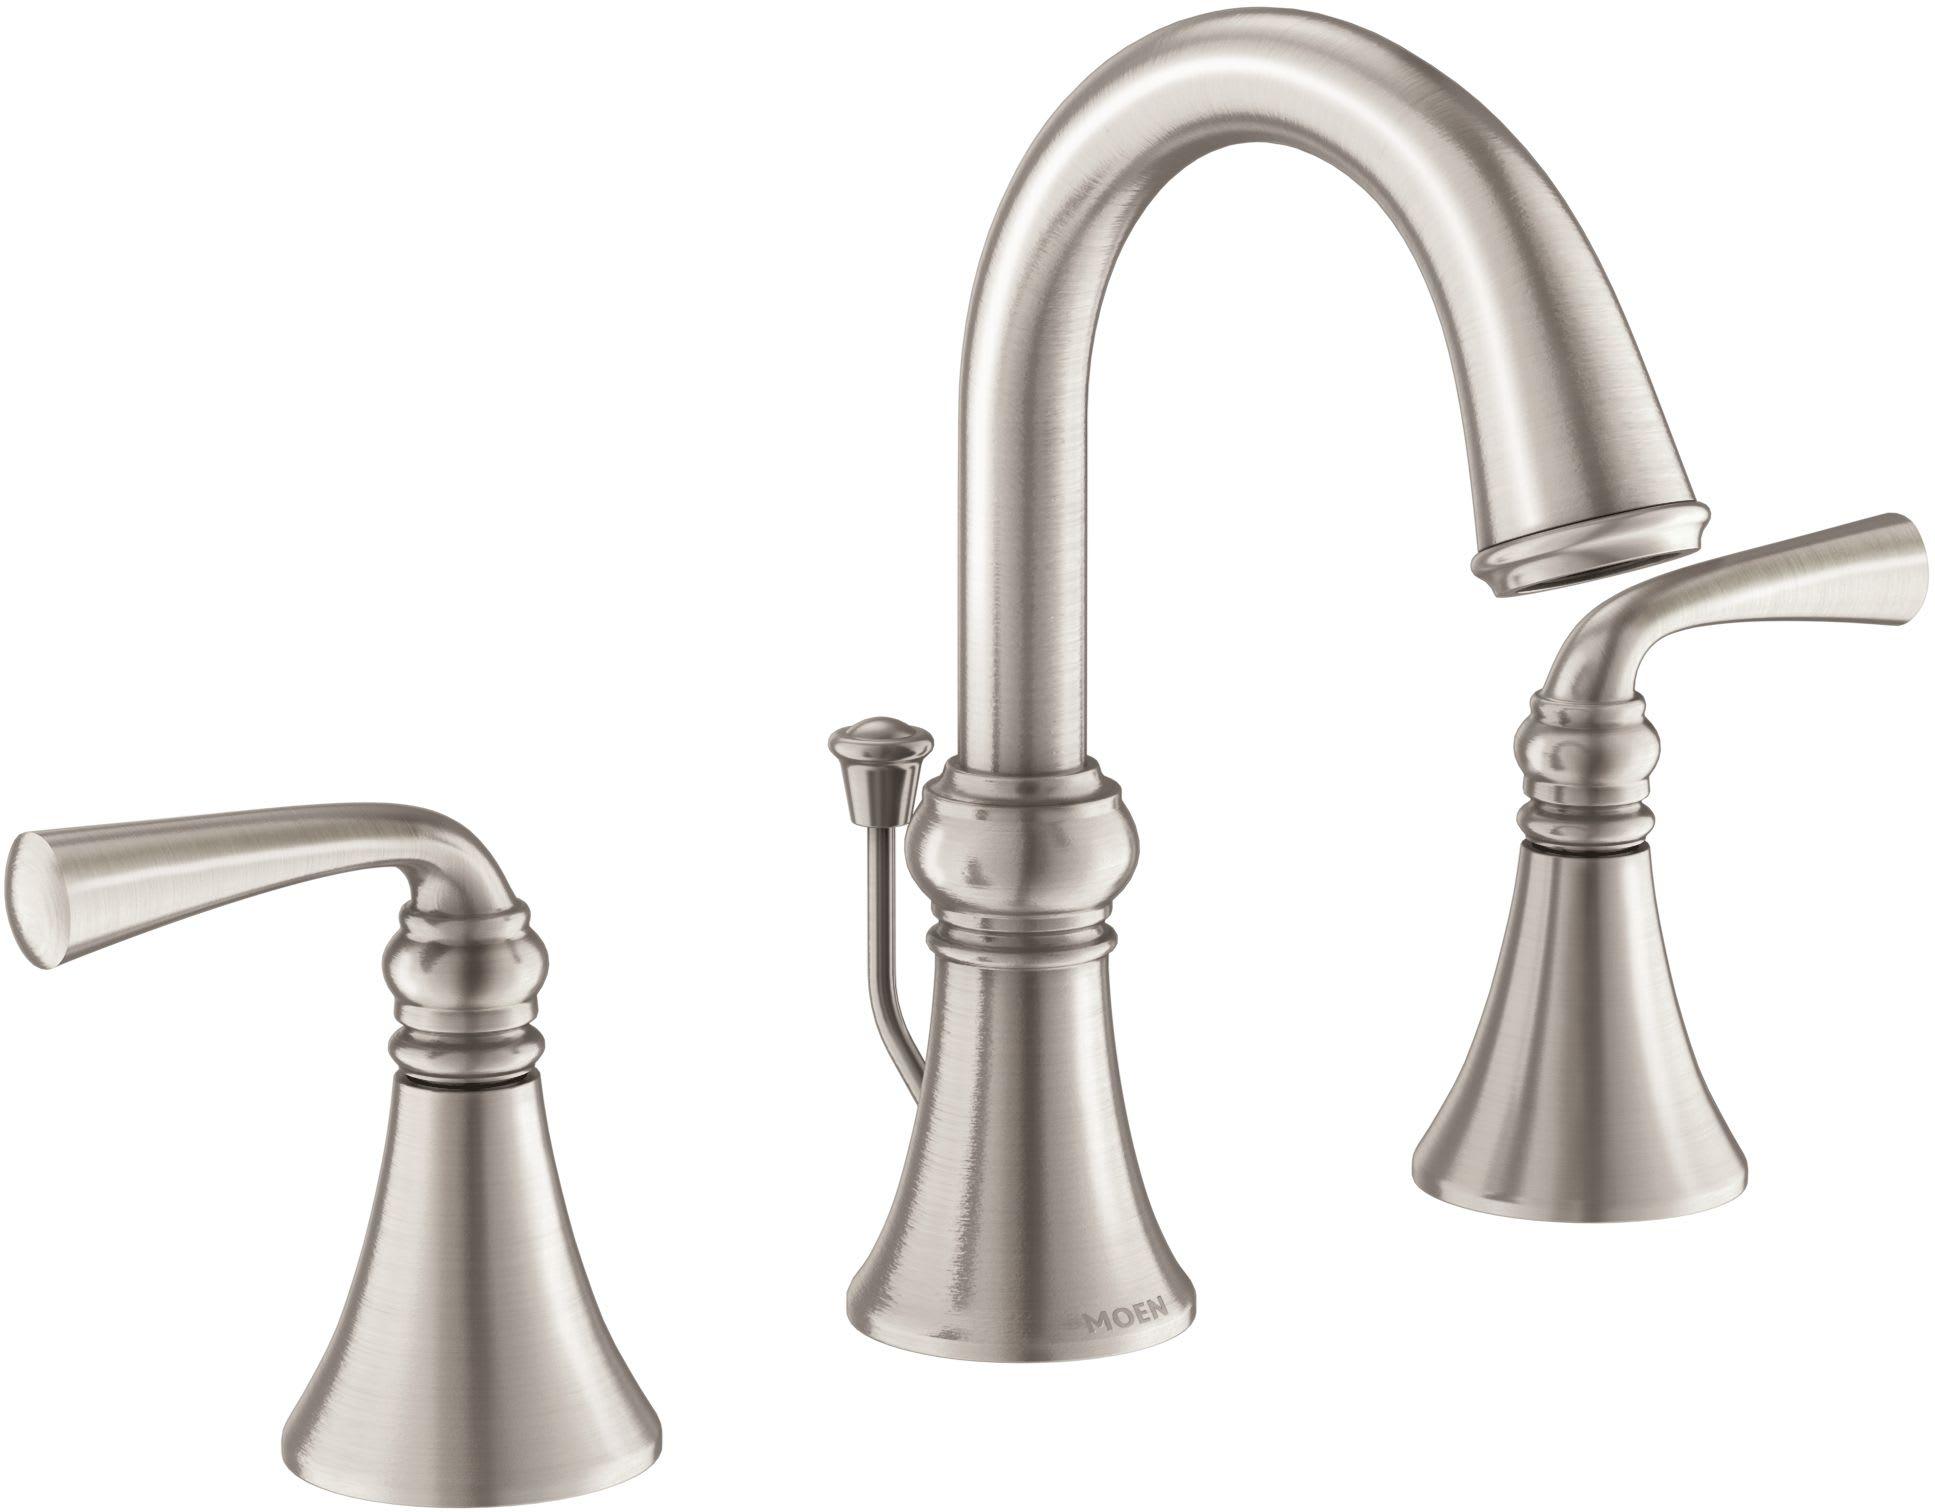 Gpm Widespread Bathroom Faucet, Moen Bathroom Faucets Widespread Brushed Nickel